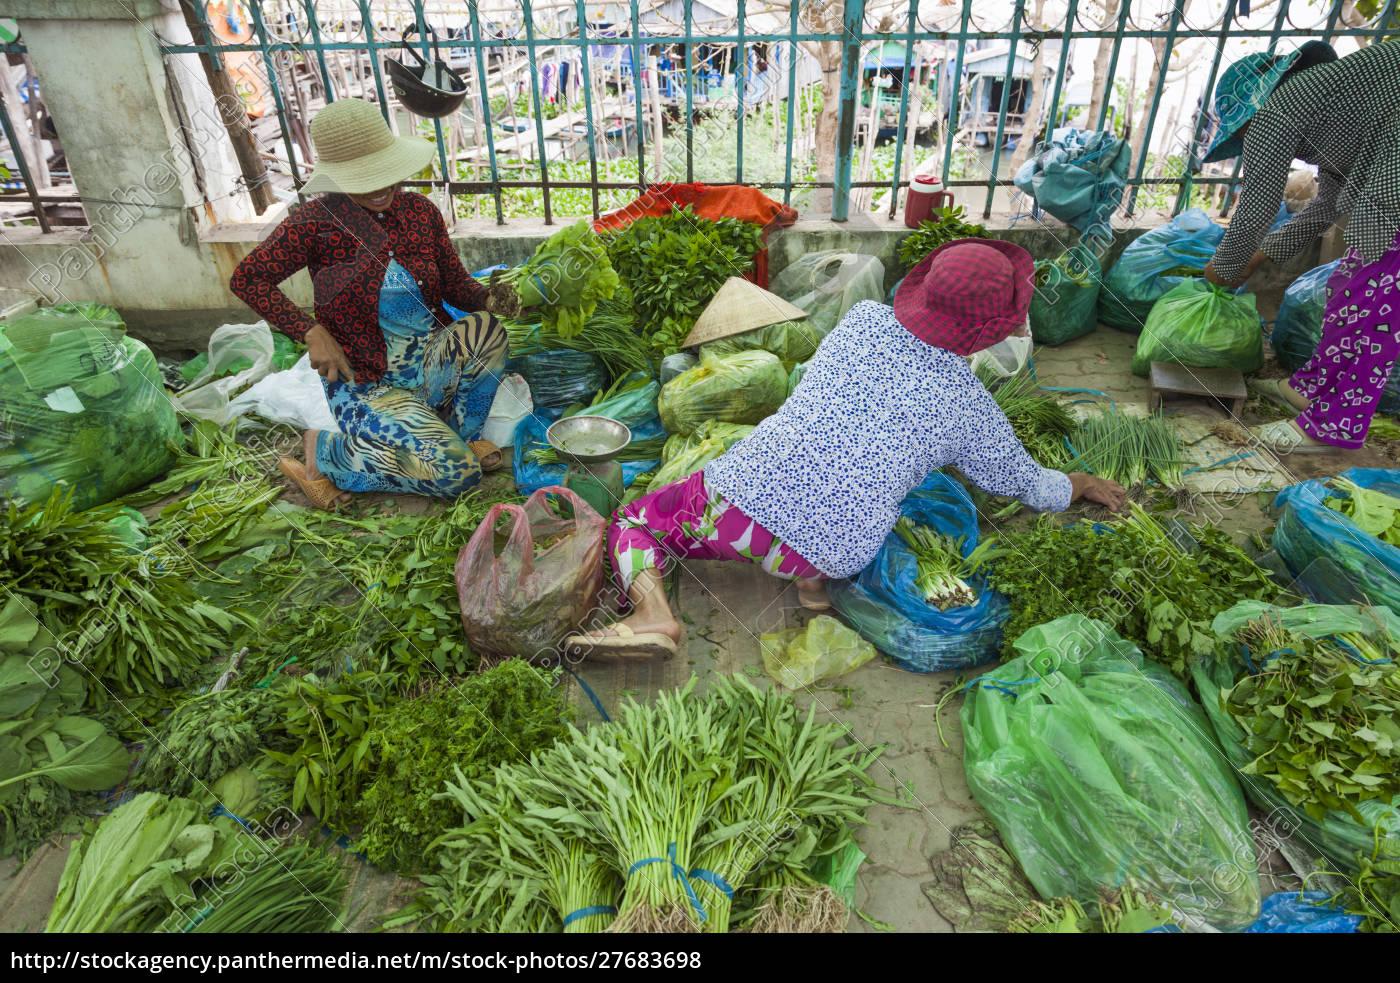 vietnam, mekong, delta., chau, doc, hau, giang, river, produzieren - 27683698